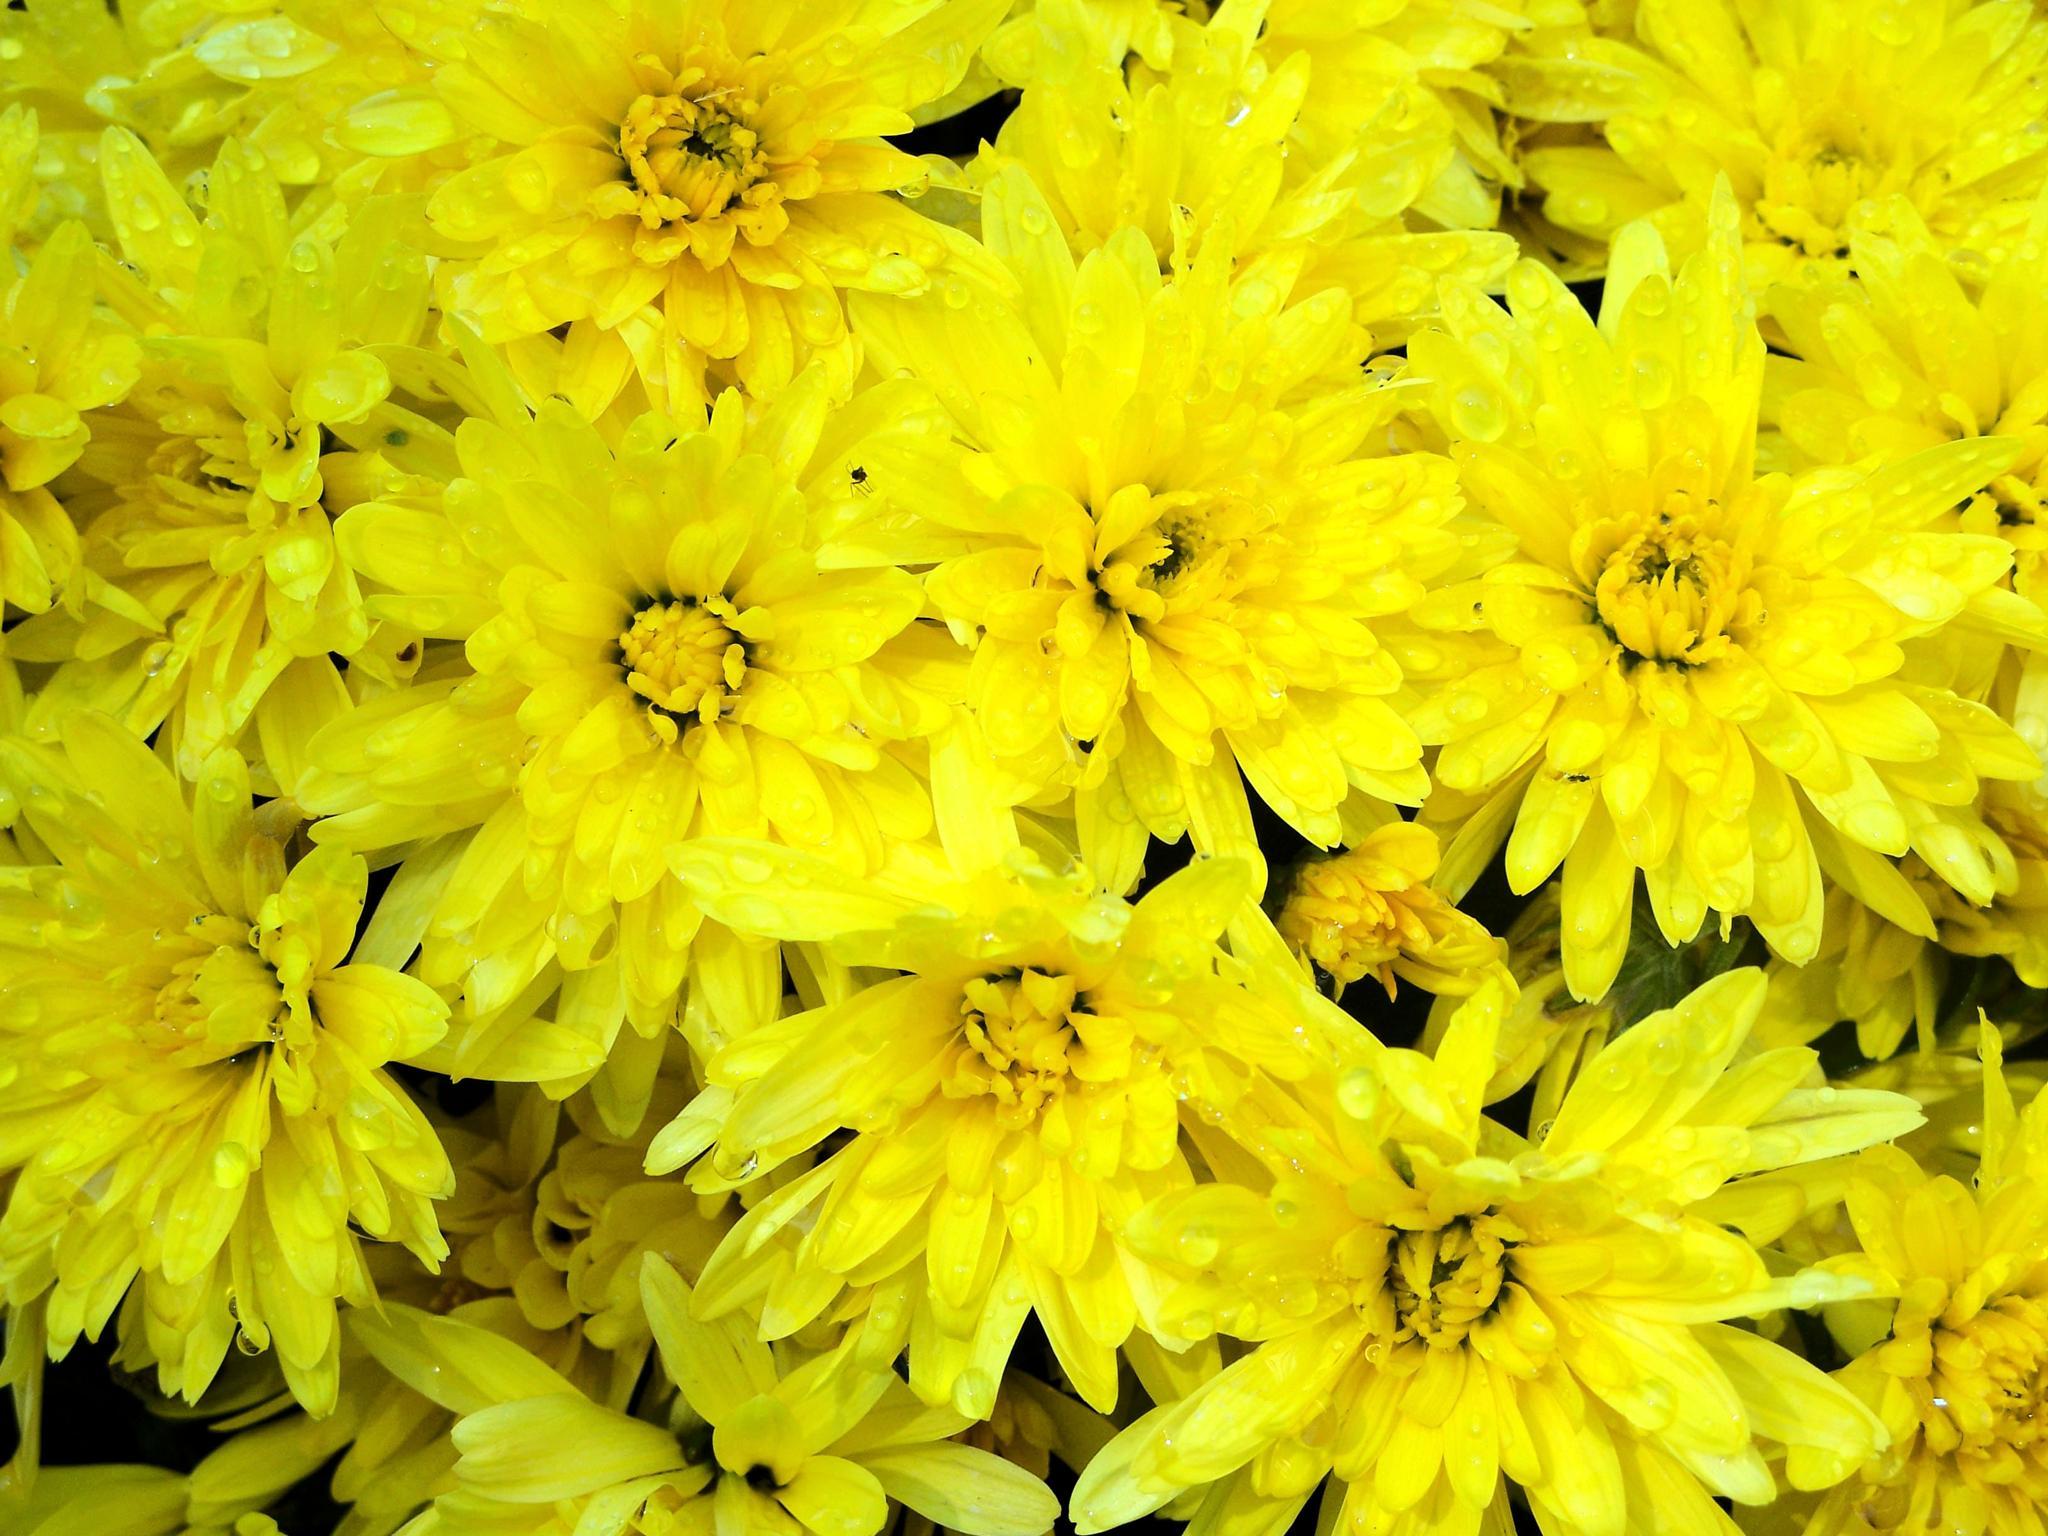 Yellow Extravaganza by wendy.becker.58